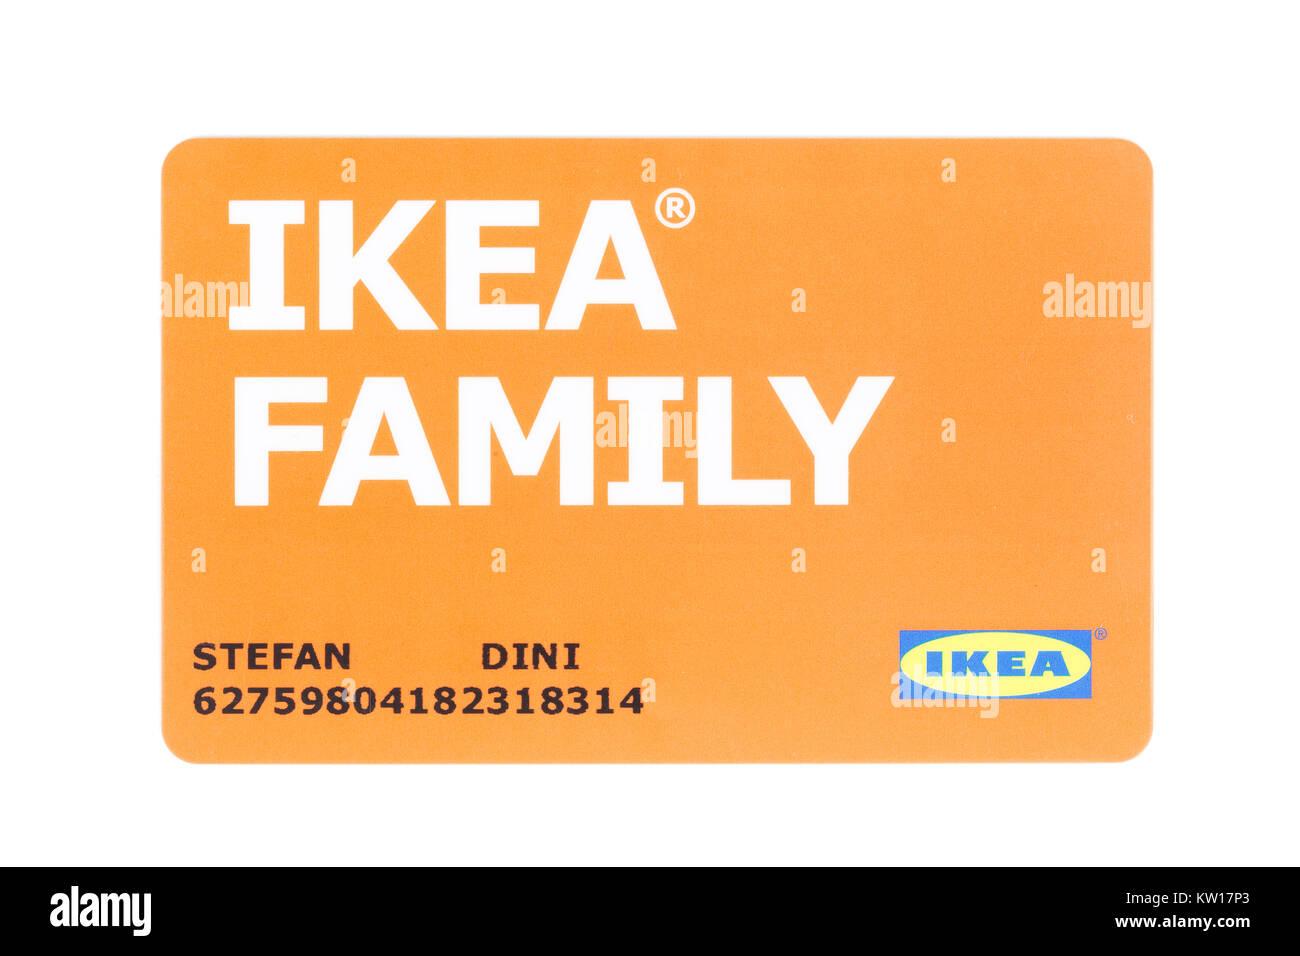 Ikea Family Card Teppich Ikea Family Ideas Benefits With